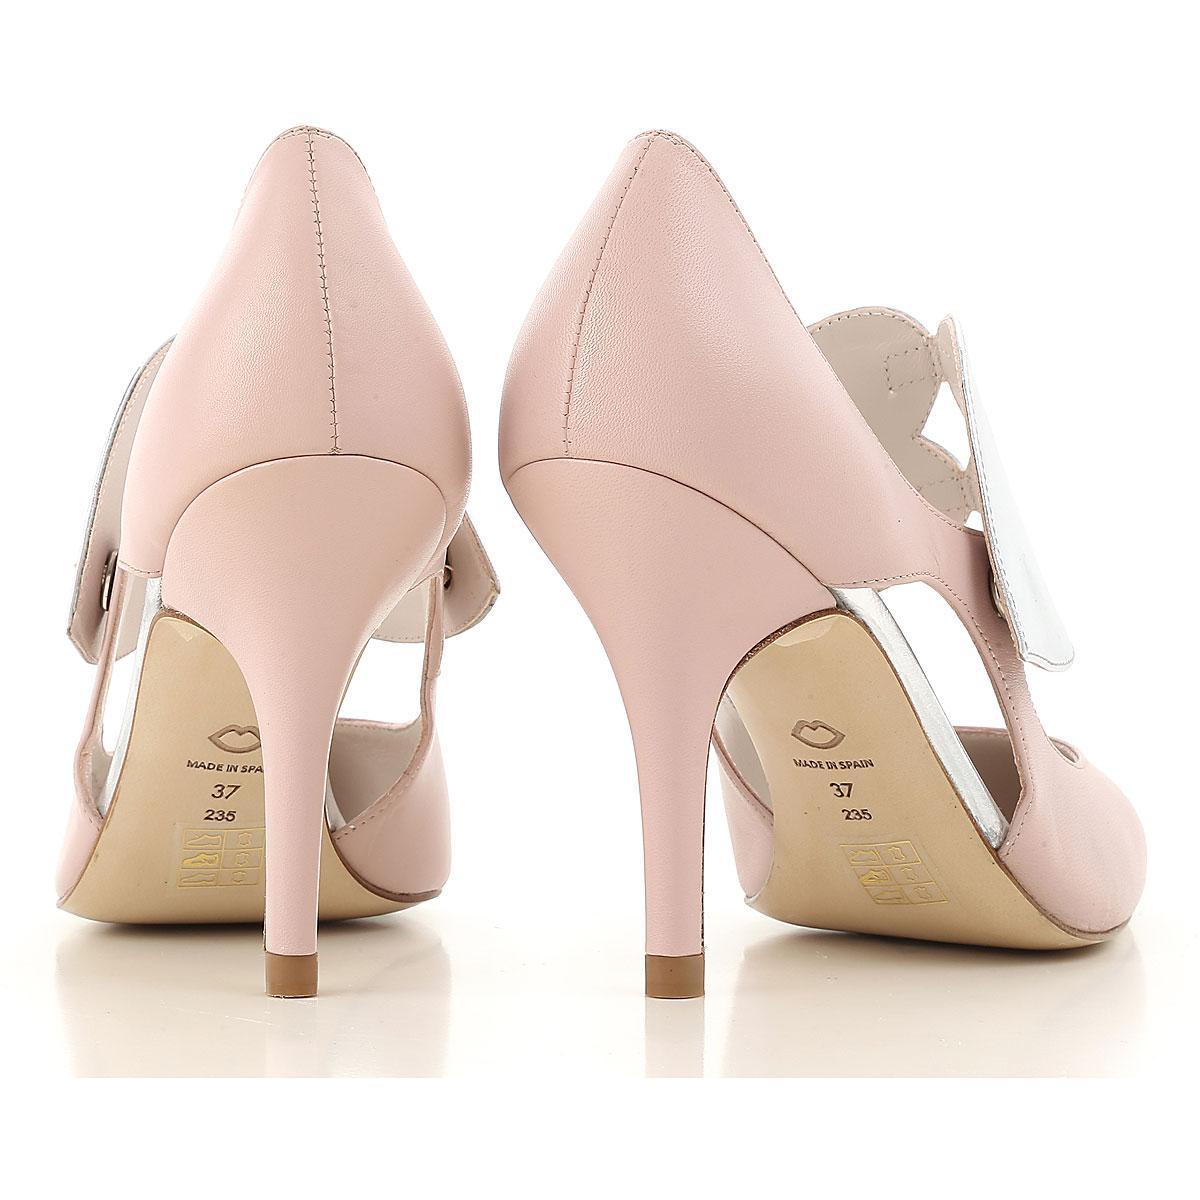 2019 Mujer Guinness Plata verano Primavera Rosa Zapatos Para Lulu YtwO4qw